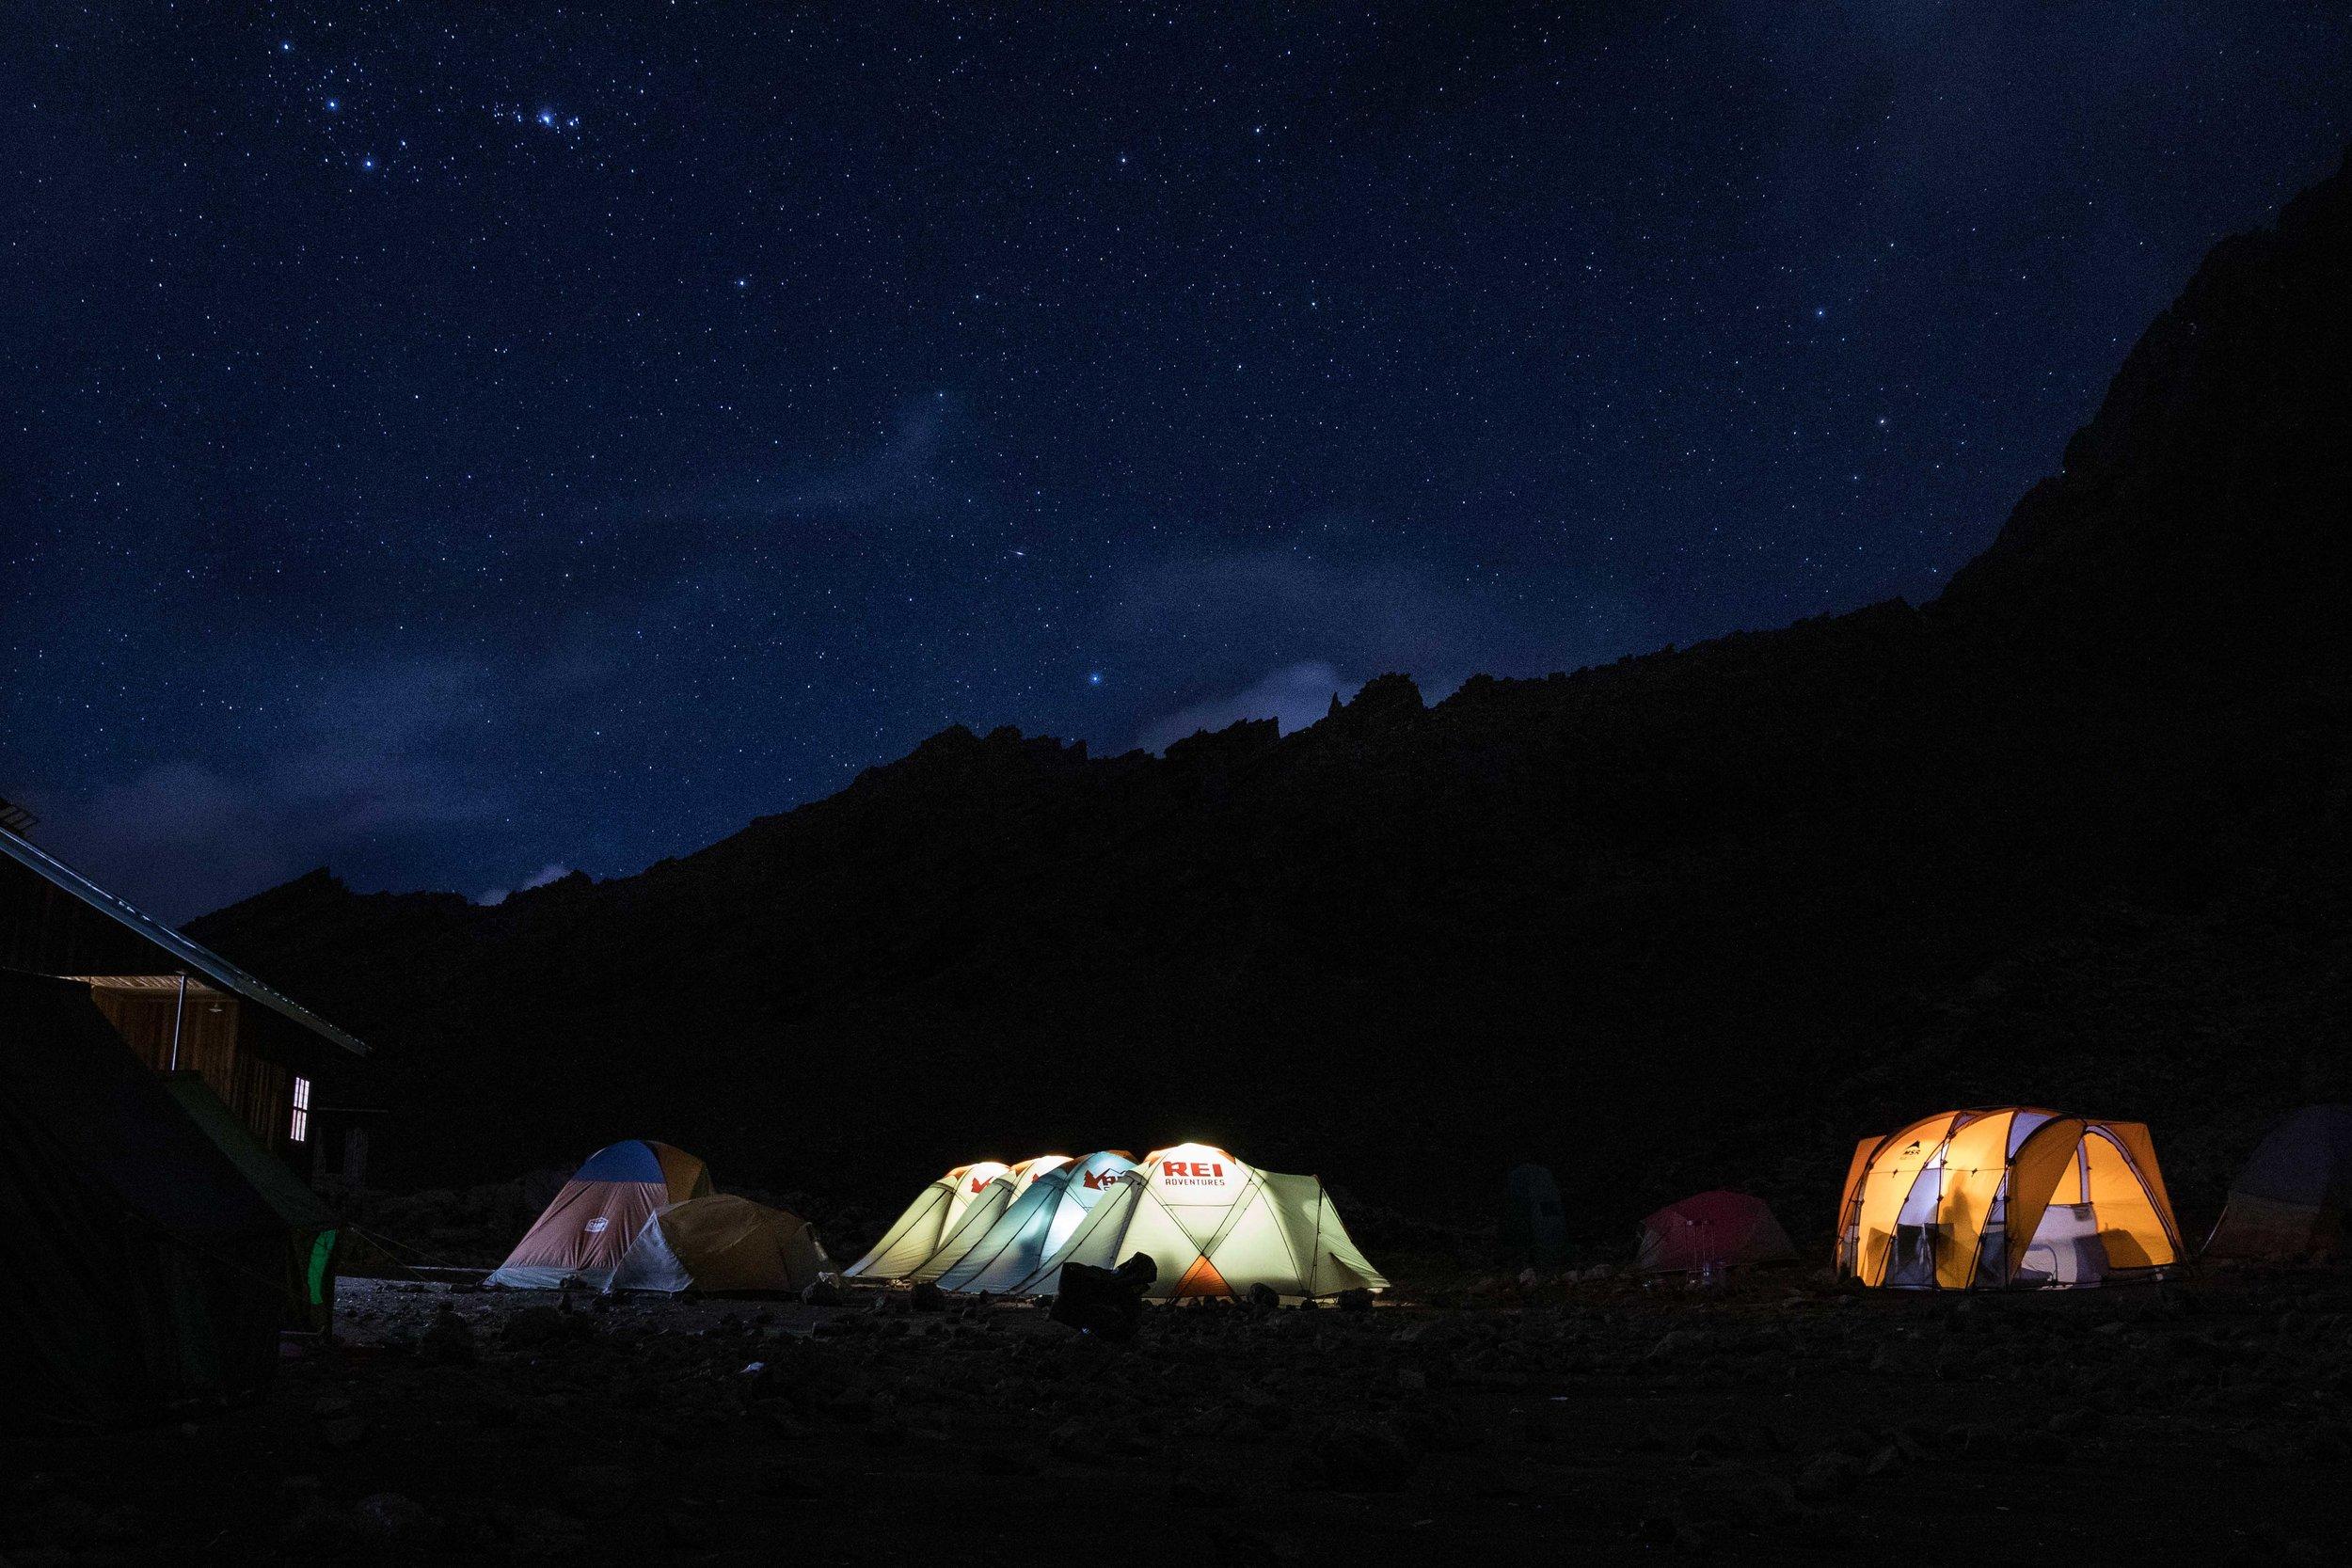 ajw_REI_Kilimanjaro-1-3.jpg